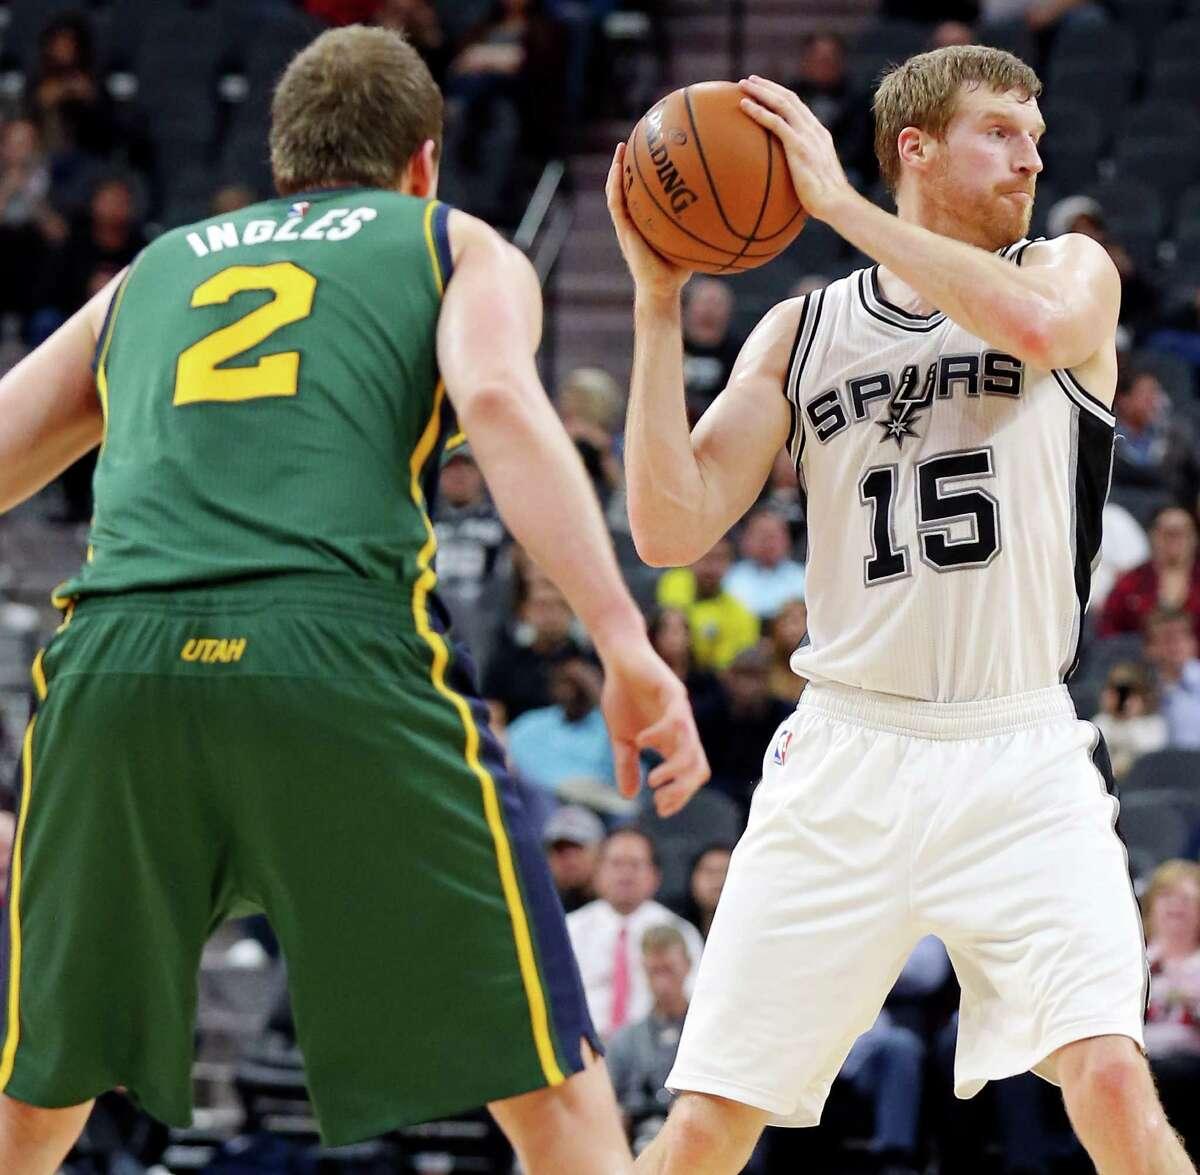 Spurs' Matt Bonner looks to pass around Utah Jazz's Joe Ingles during second half action on Dec. 14, 2015 at the AT&T Center.